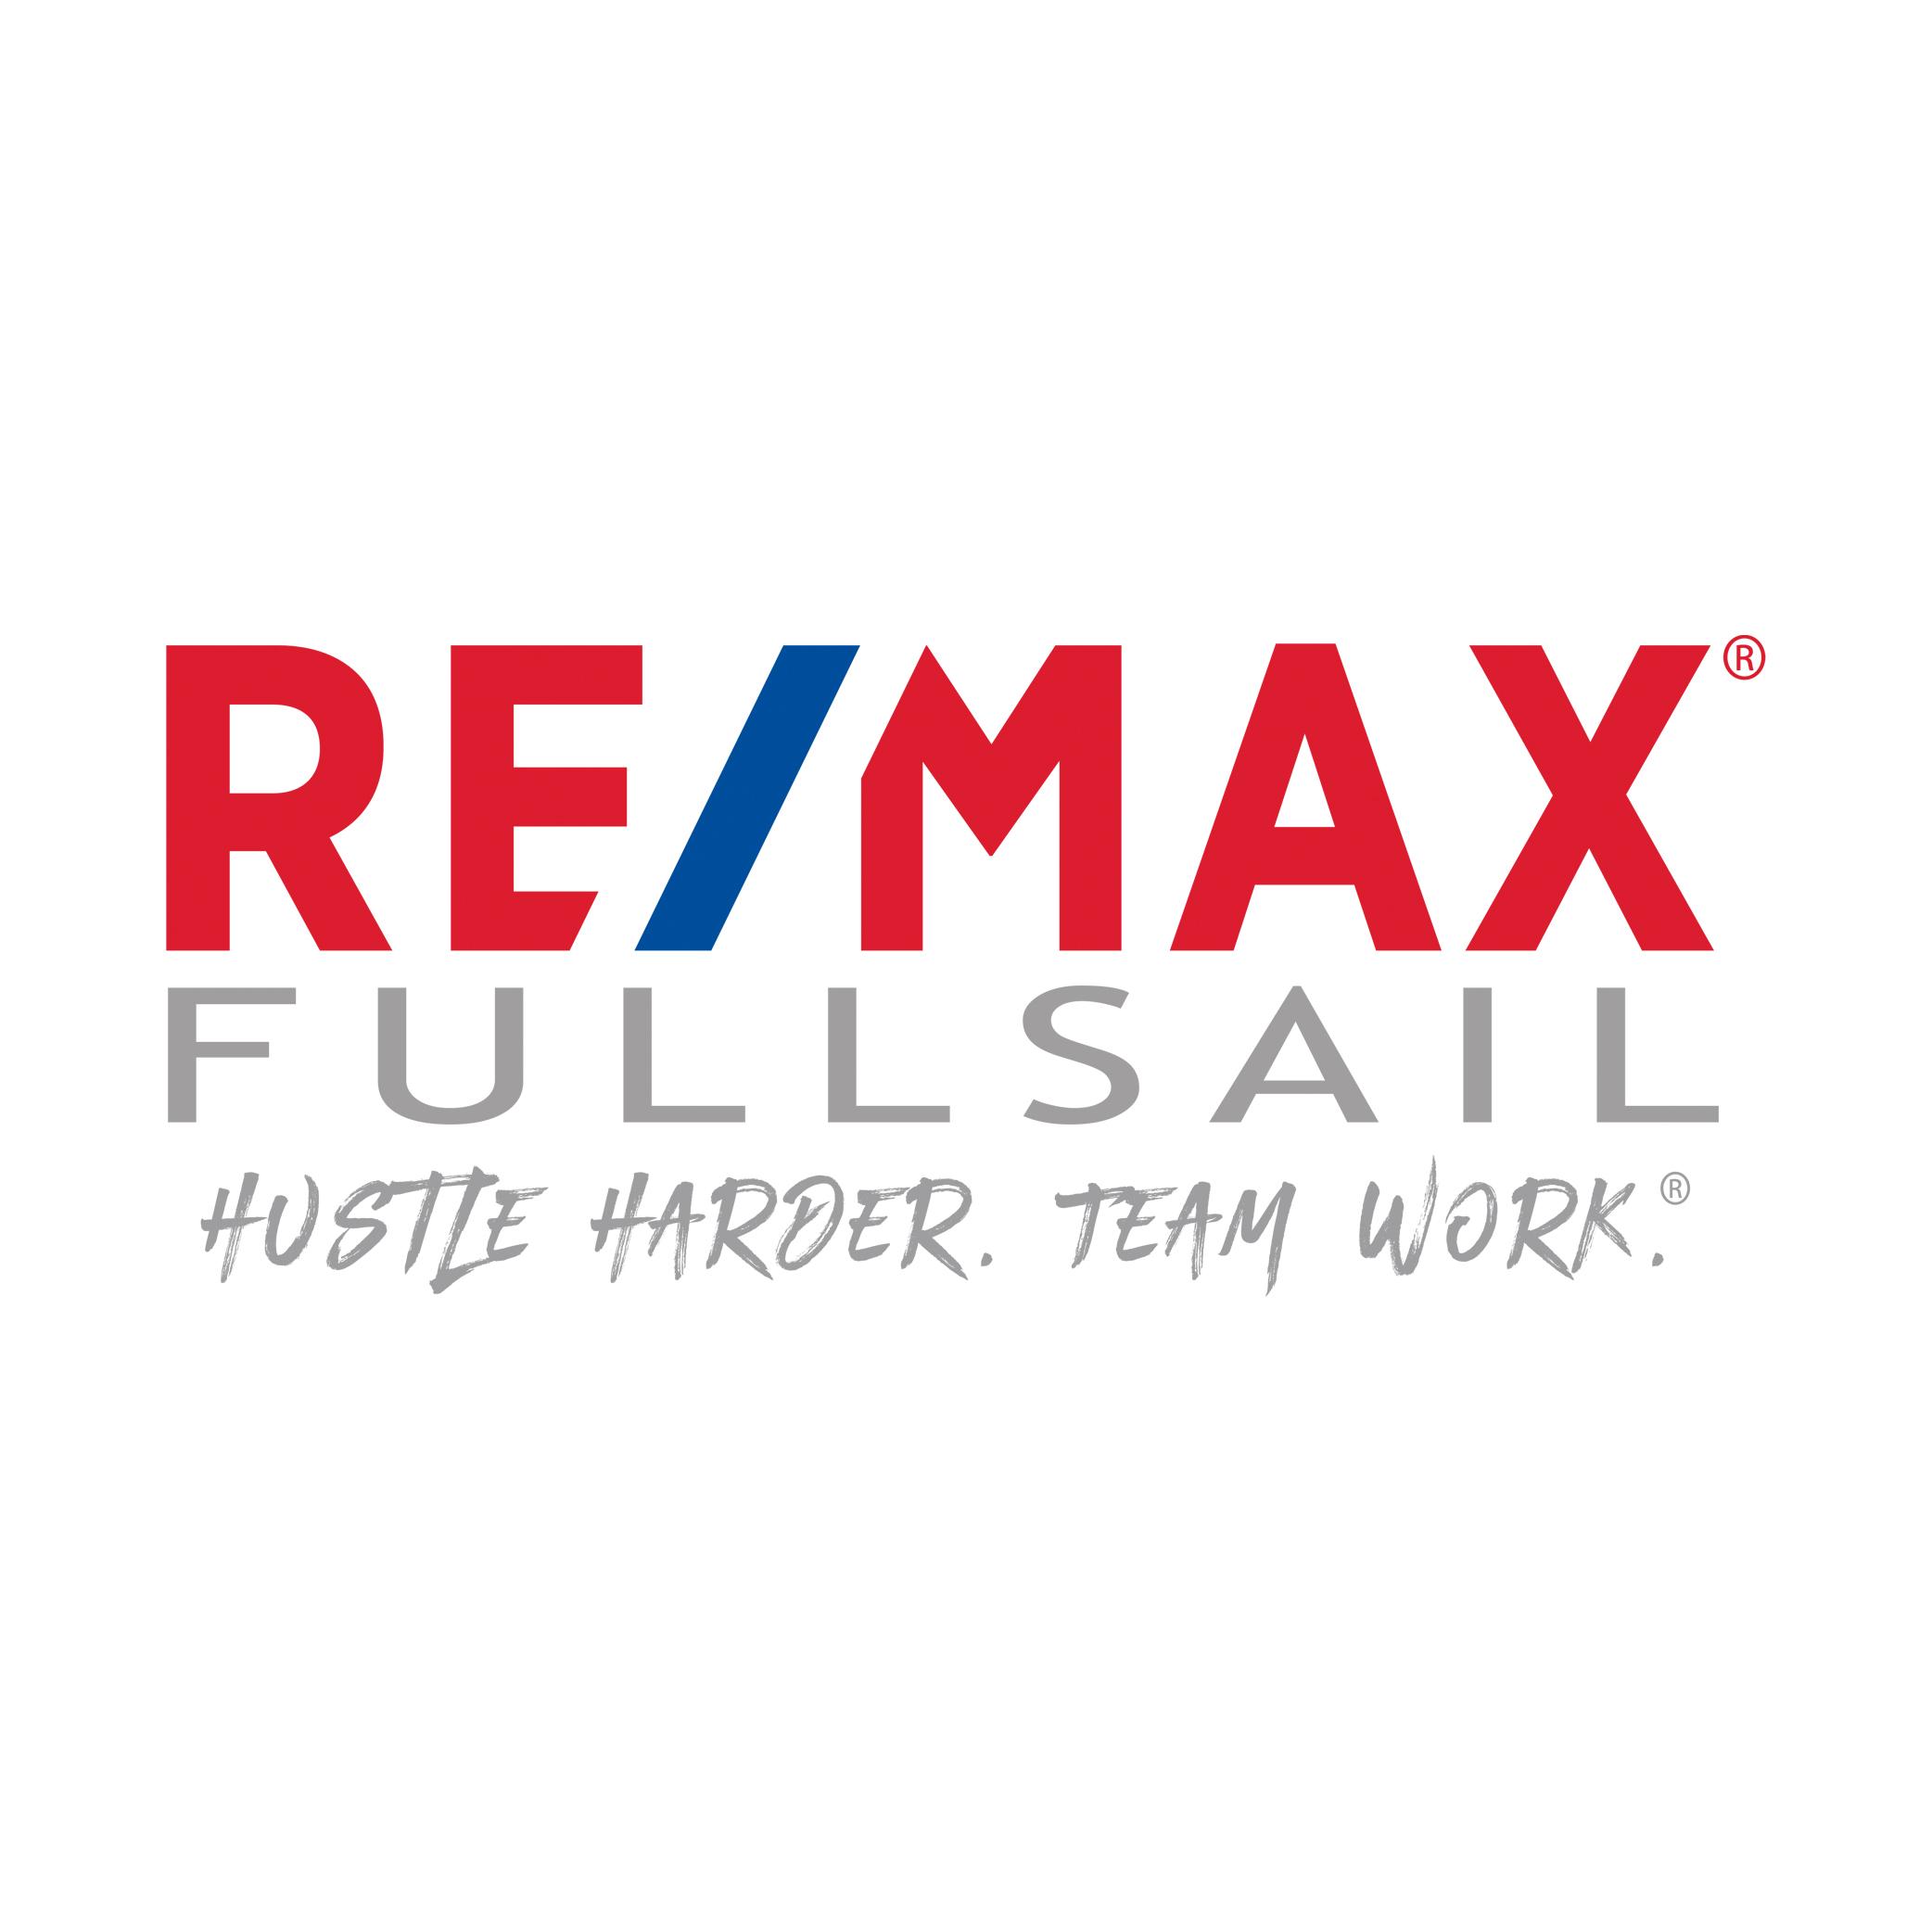 RE/MAX FullSail logo